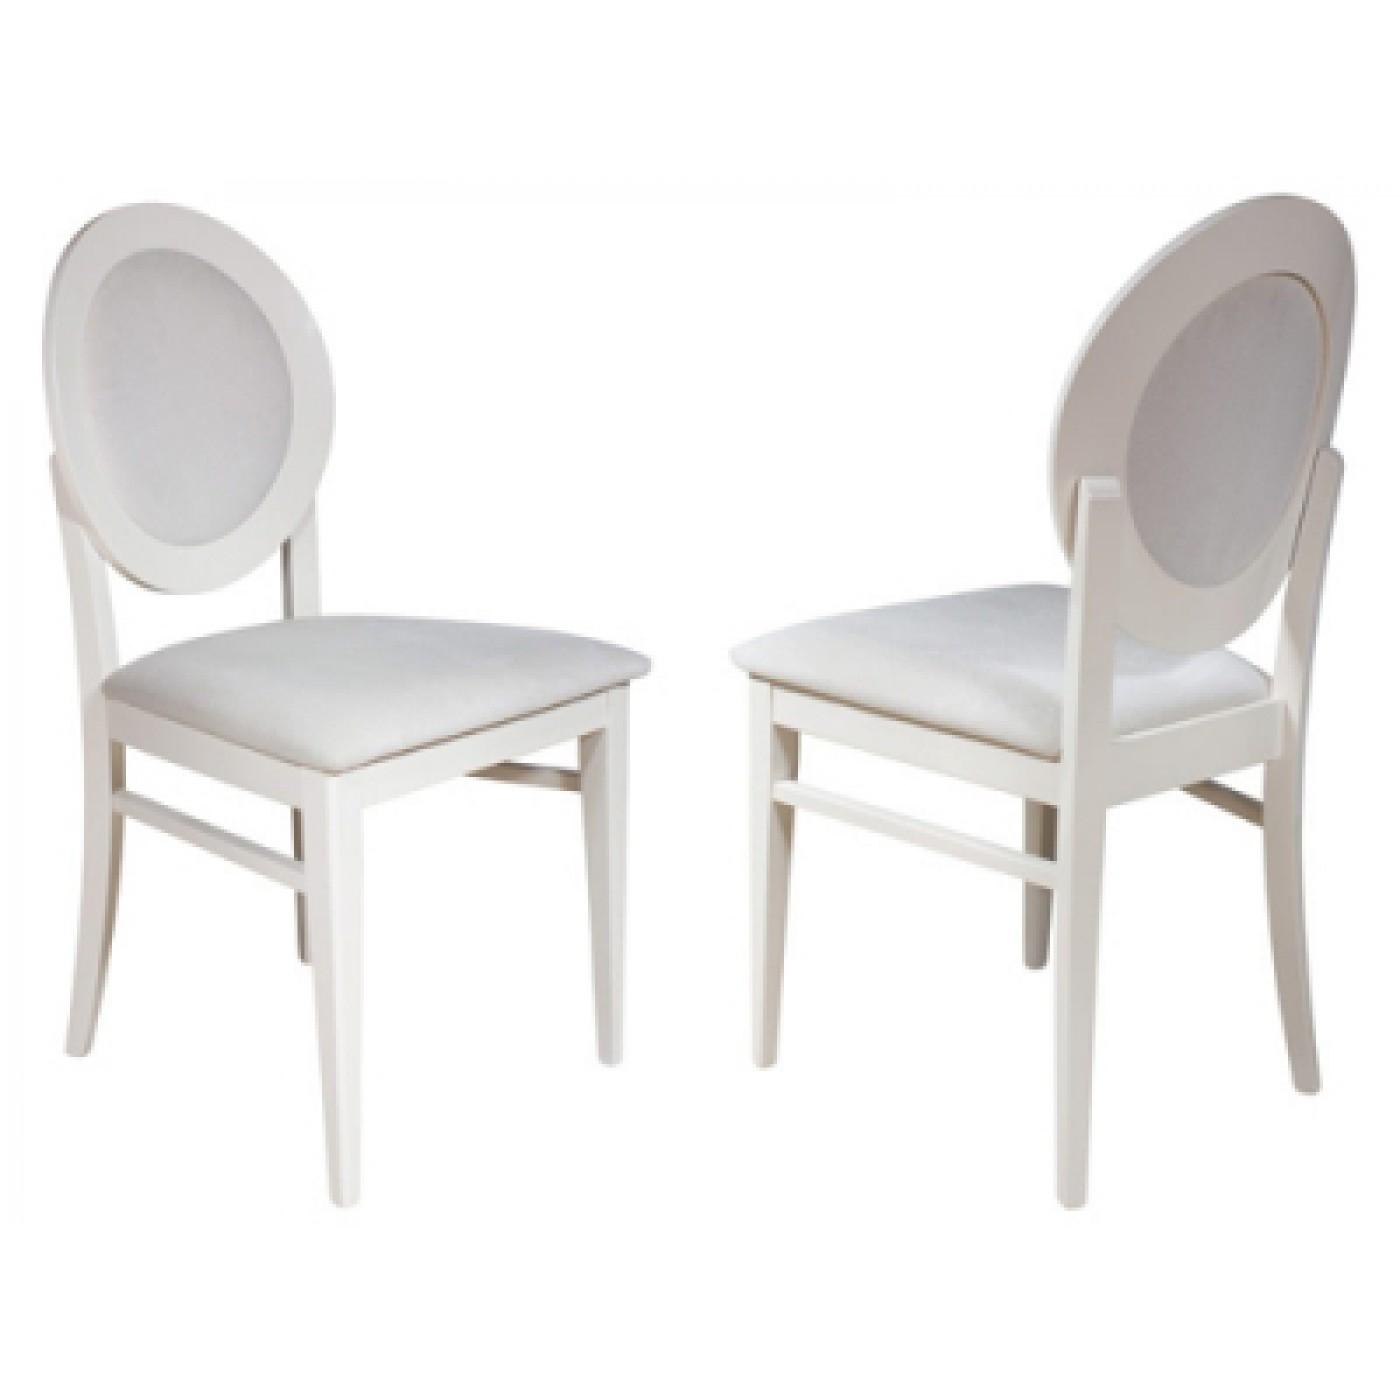 "Обеденная зона (стол ""Стивен"", стул ""Дэн"")"